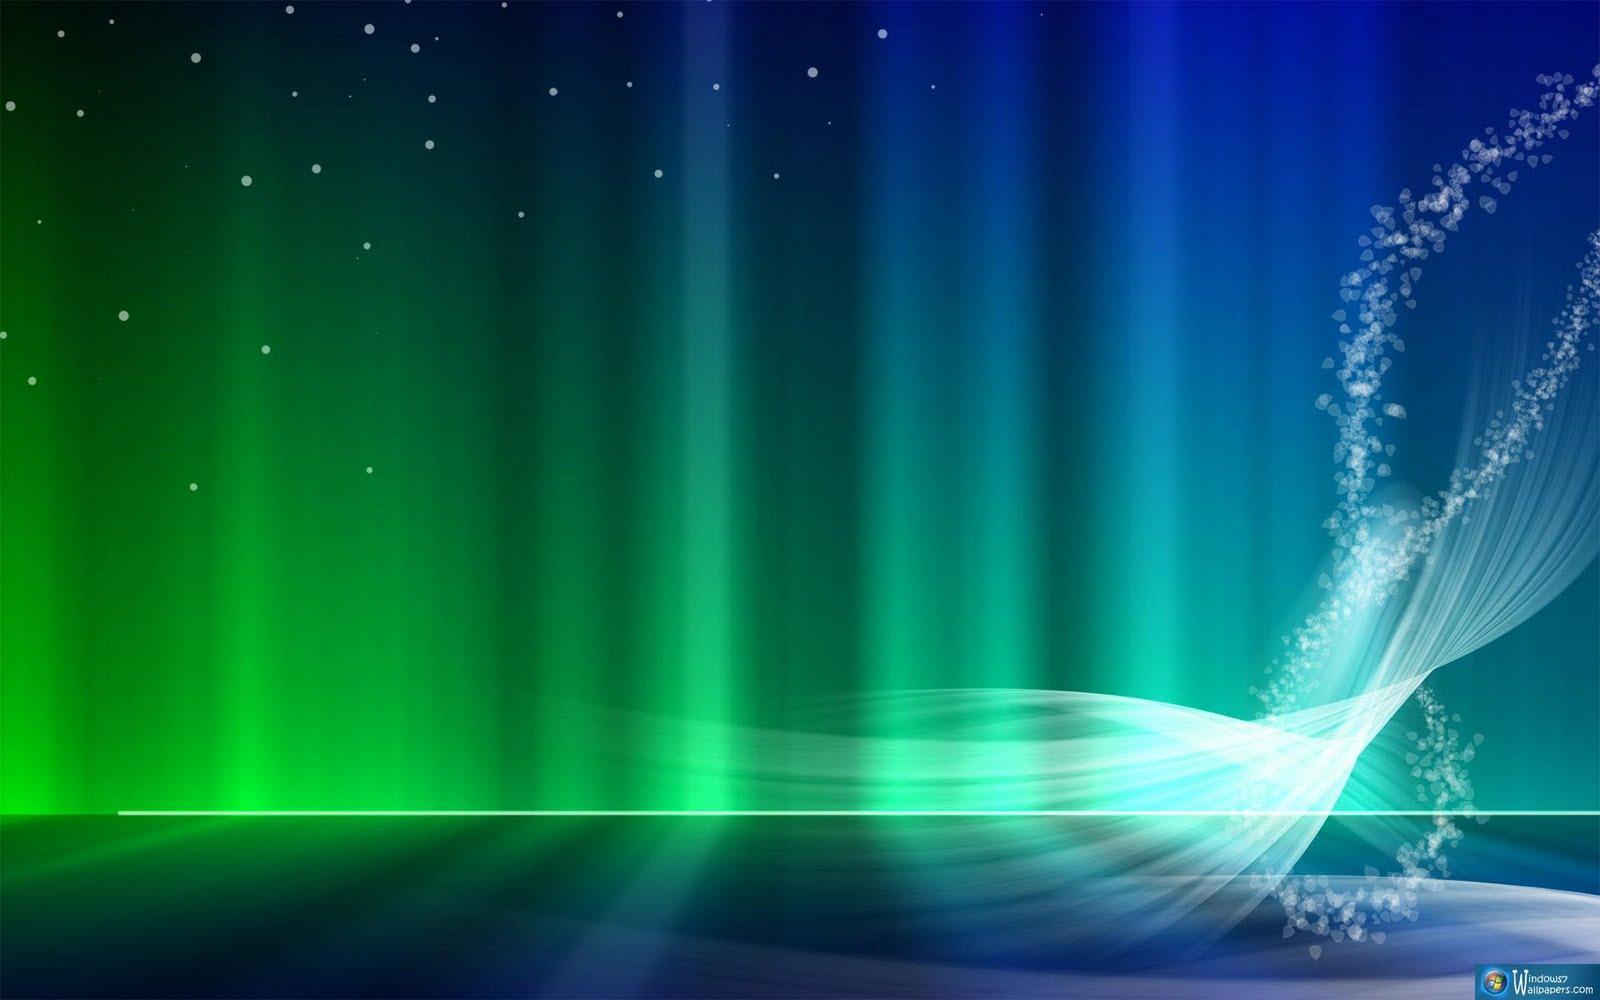 http://3.bp.blogspot.com/_rzGuJXE1bIg/S79SxYJUSzI/AAAAAAAAAL0/bzamim_YUl8/s1600/windo7-wallpaper.jpg